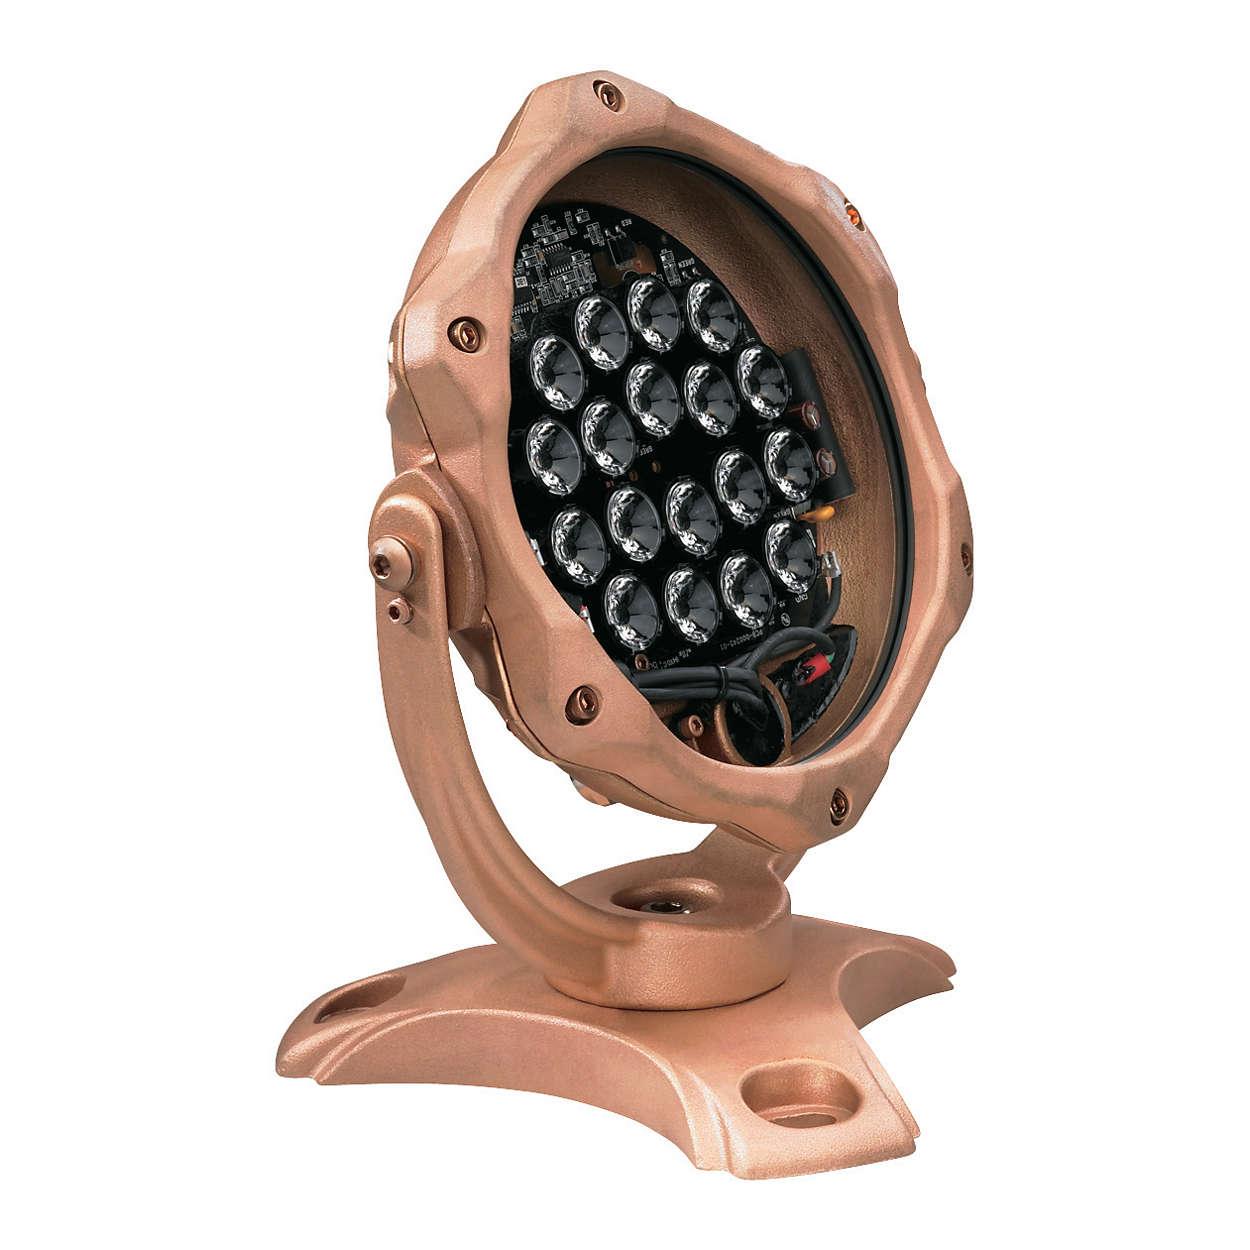 C-Splash 2 – 담수 및 해수 환경에서 사용할 수 있는 색상 변화 기능의 수중 LED 스포트라이트